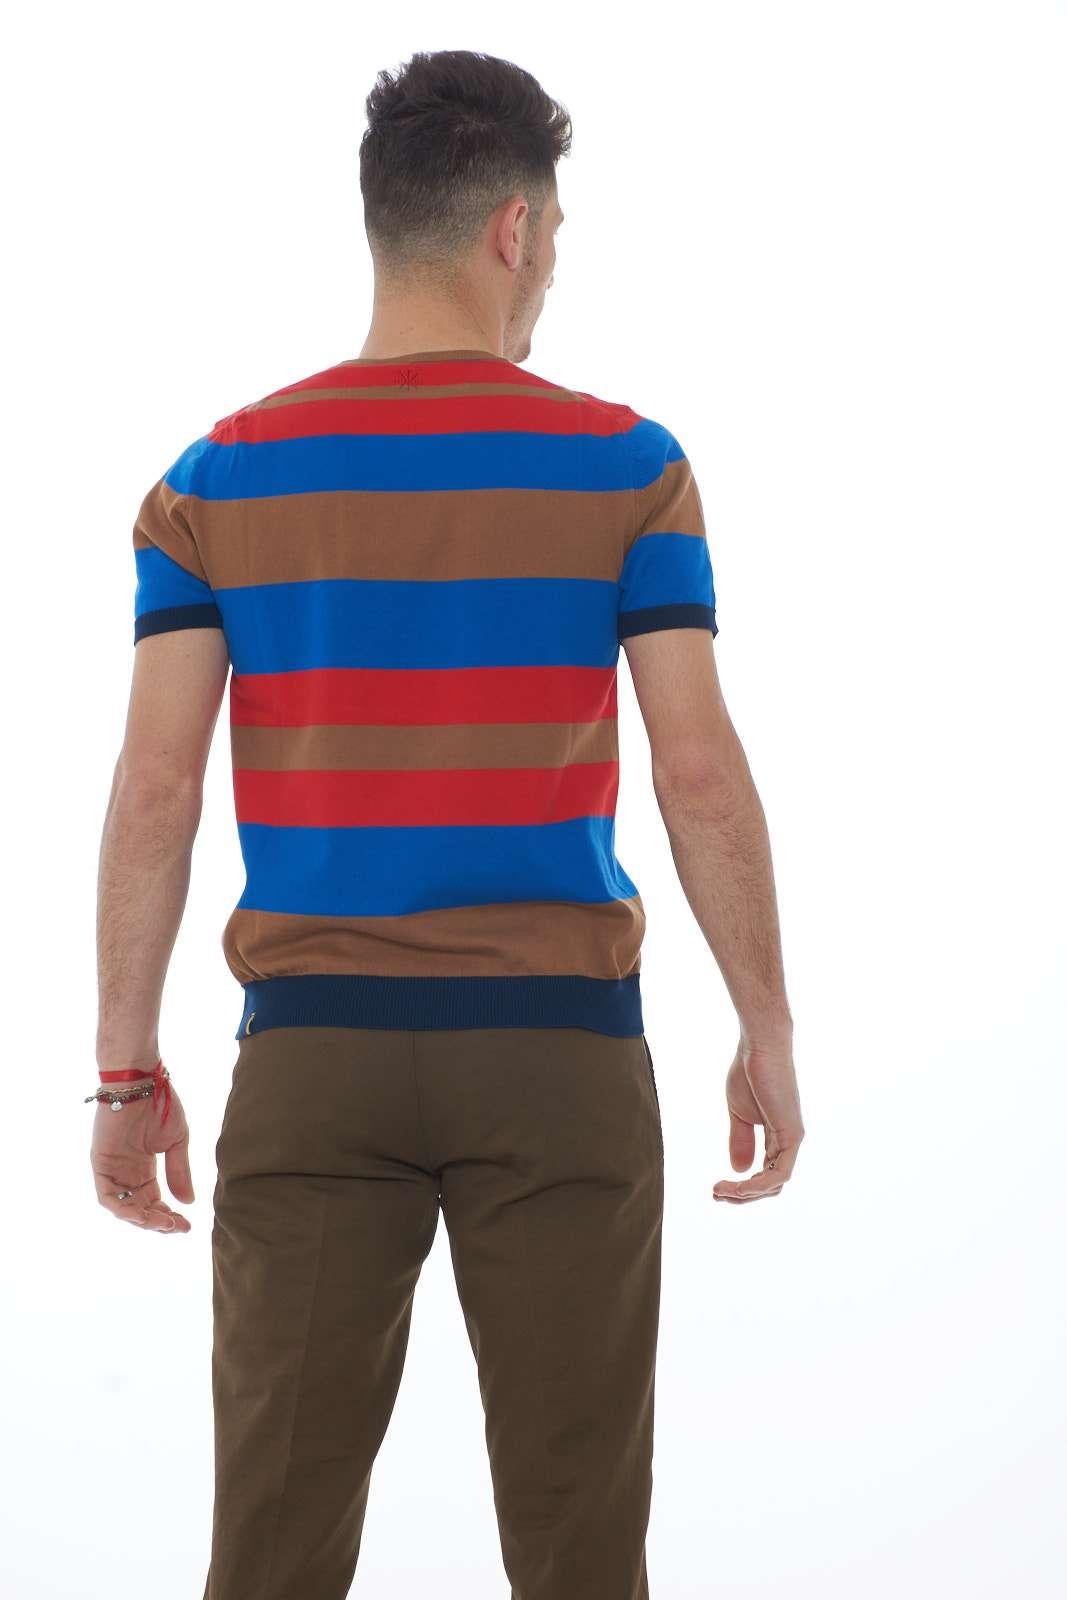 https://www.parmax.com/media/catalog/product/a/i/PE-outlet_parmax-t-shirt-uomo-Manuel-Ritz-2632m517%20193393-C.jpg